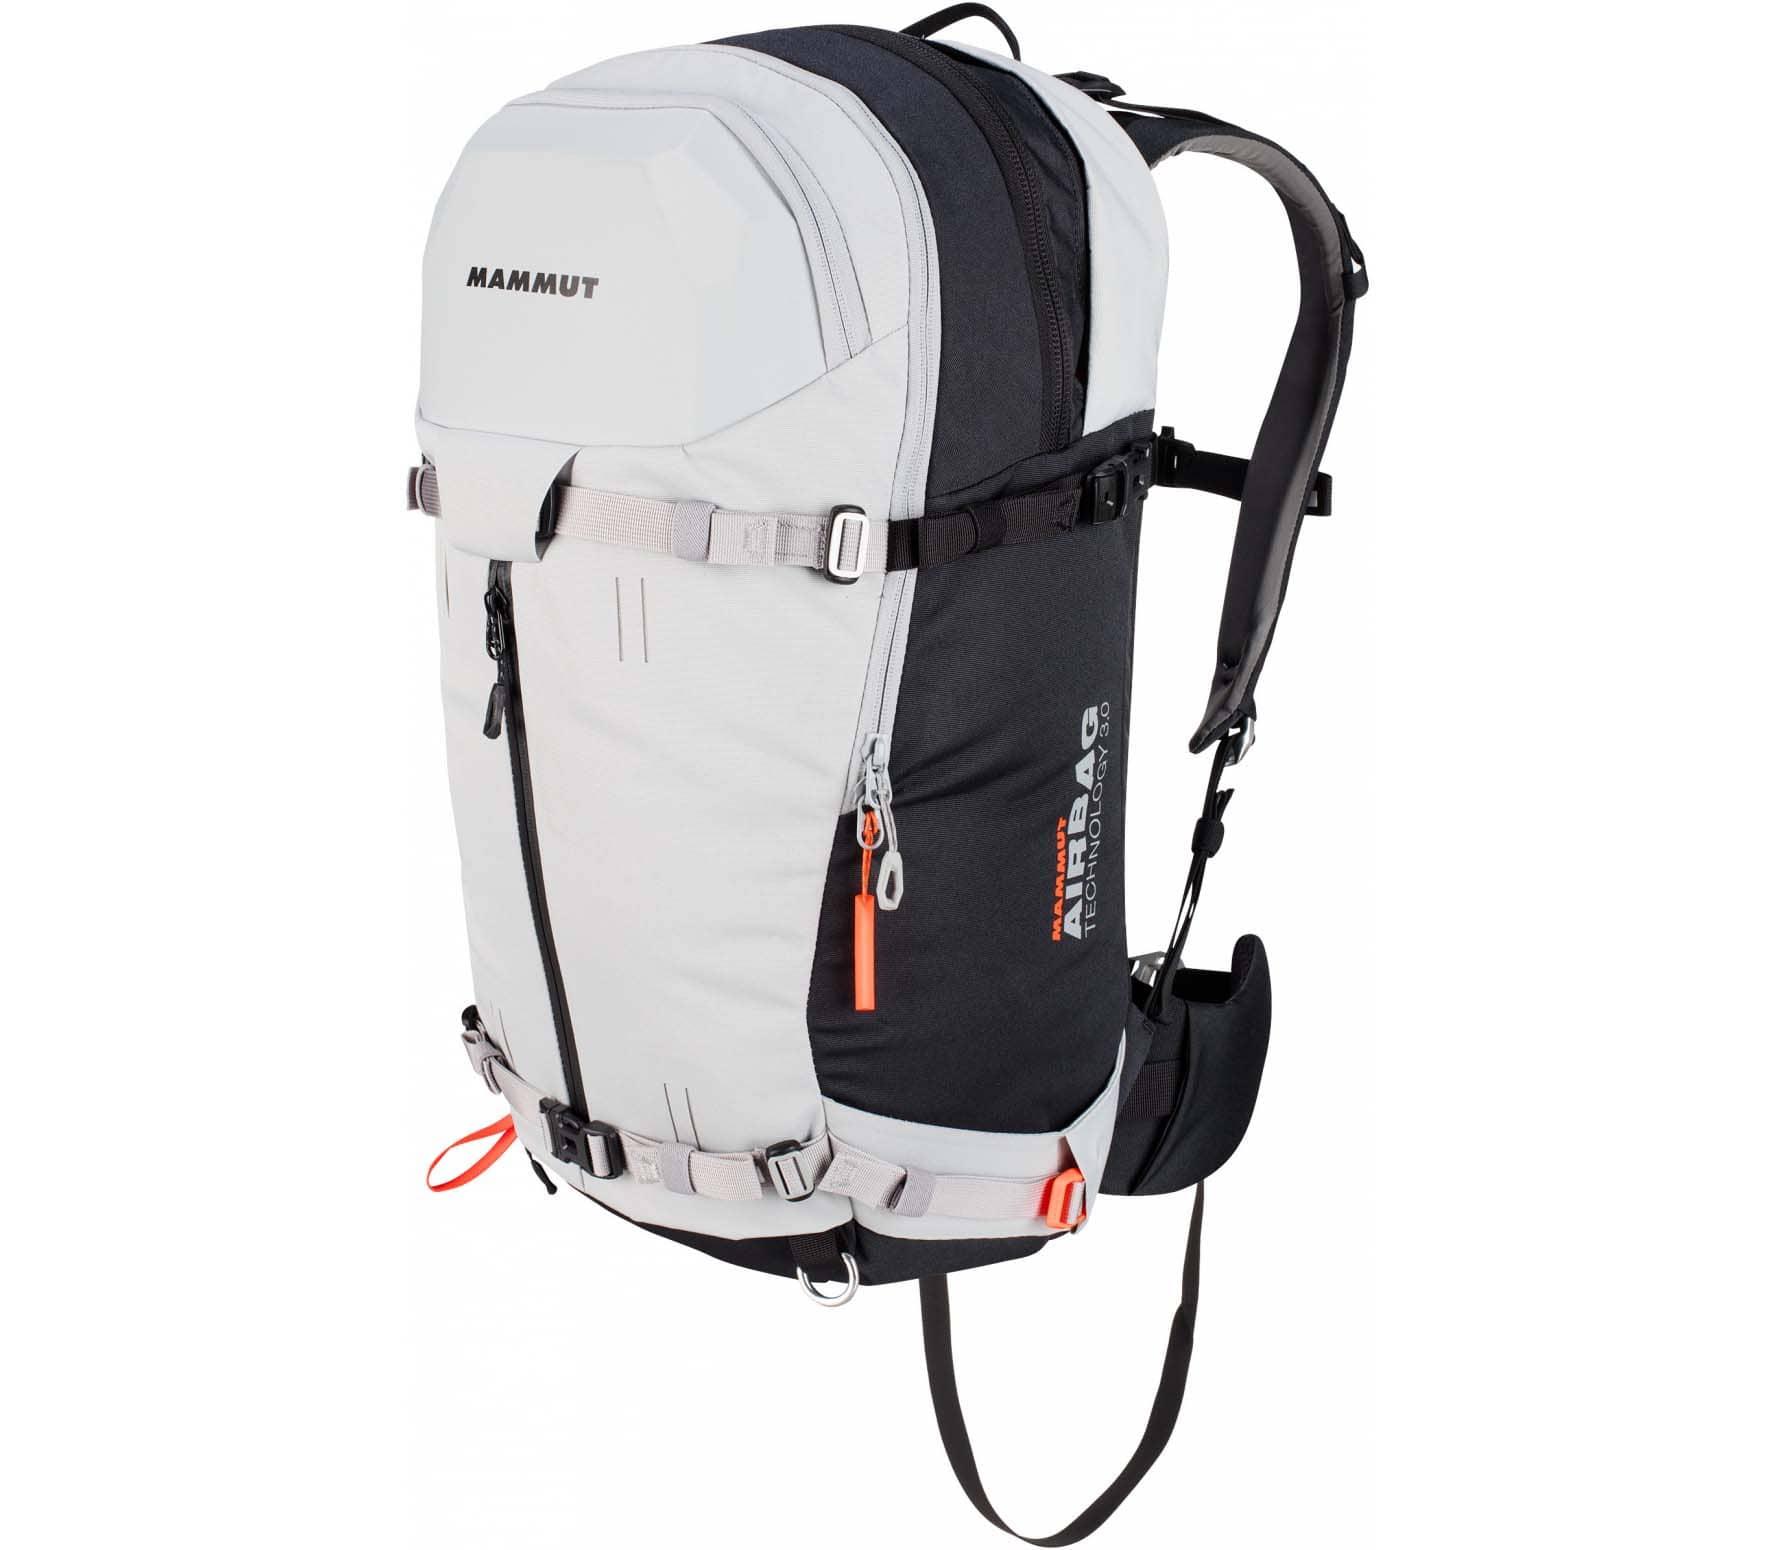 Mammut Pro X Removable Airbag 3.0 Lavinryggsäck OS